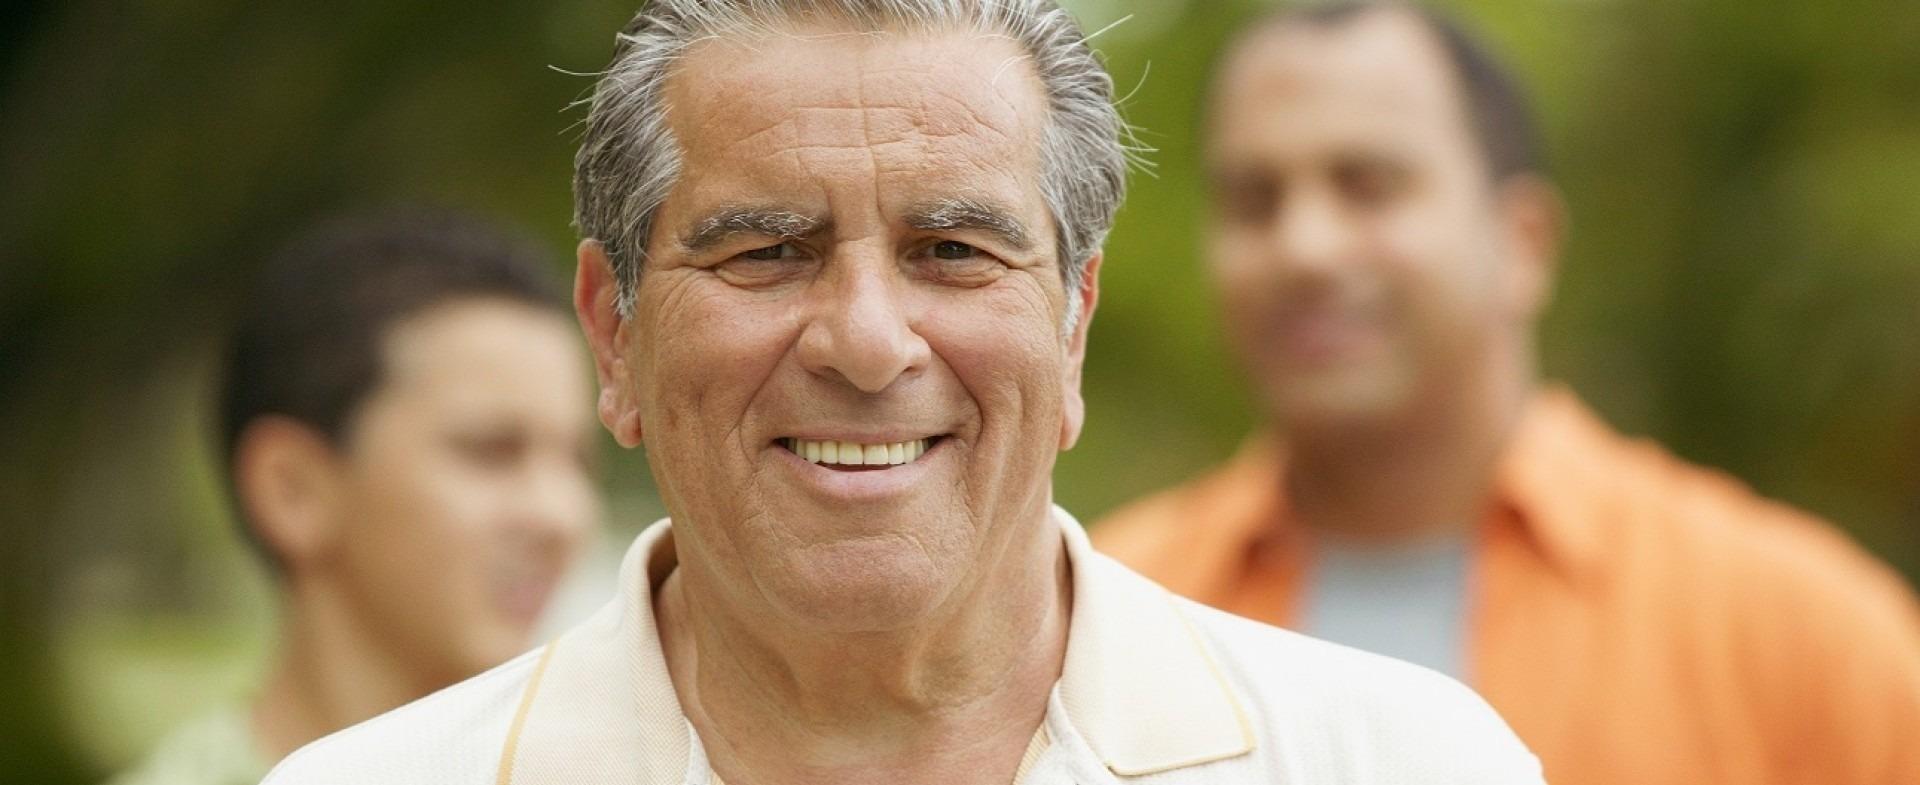 Senior citizen smiling